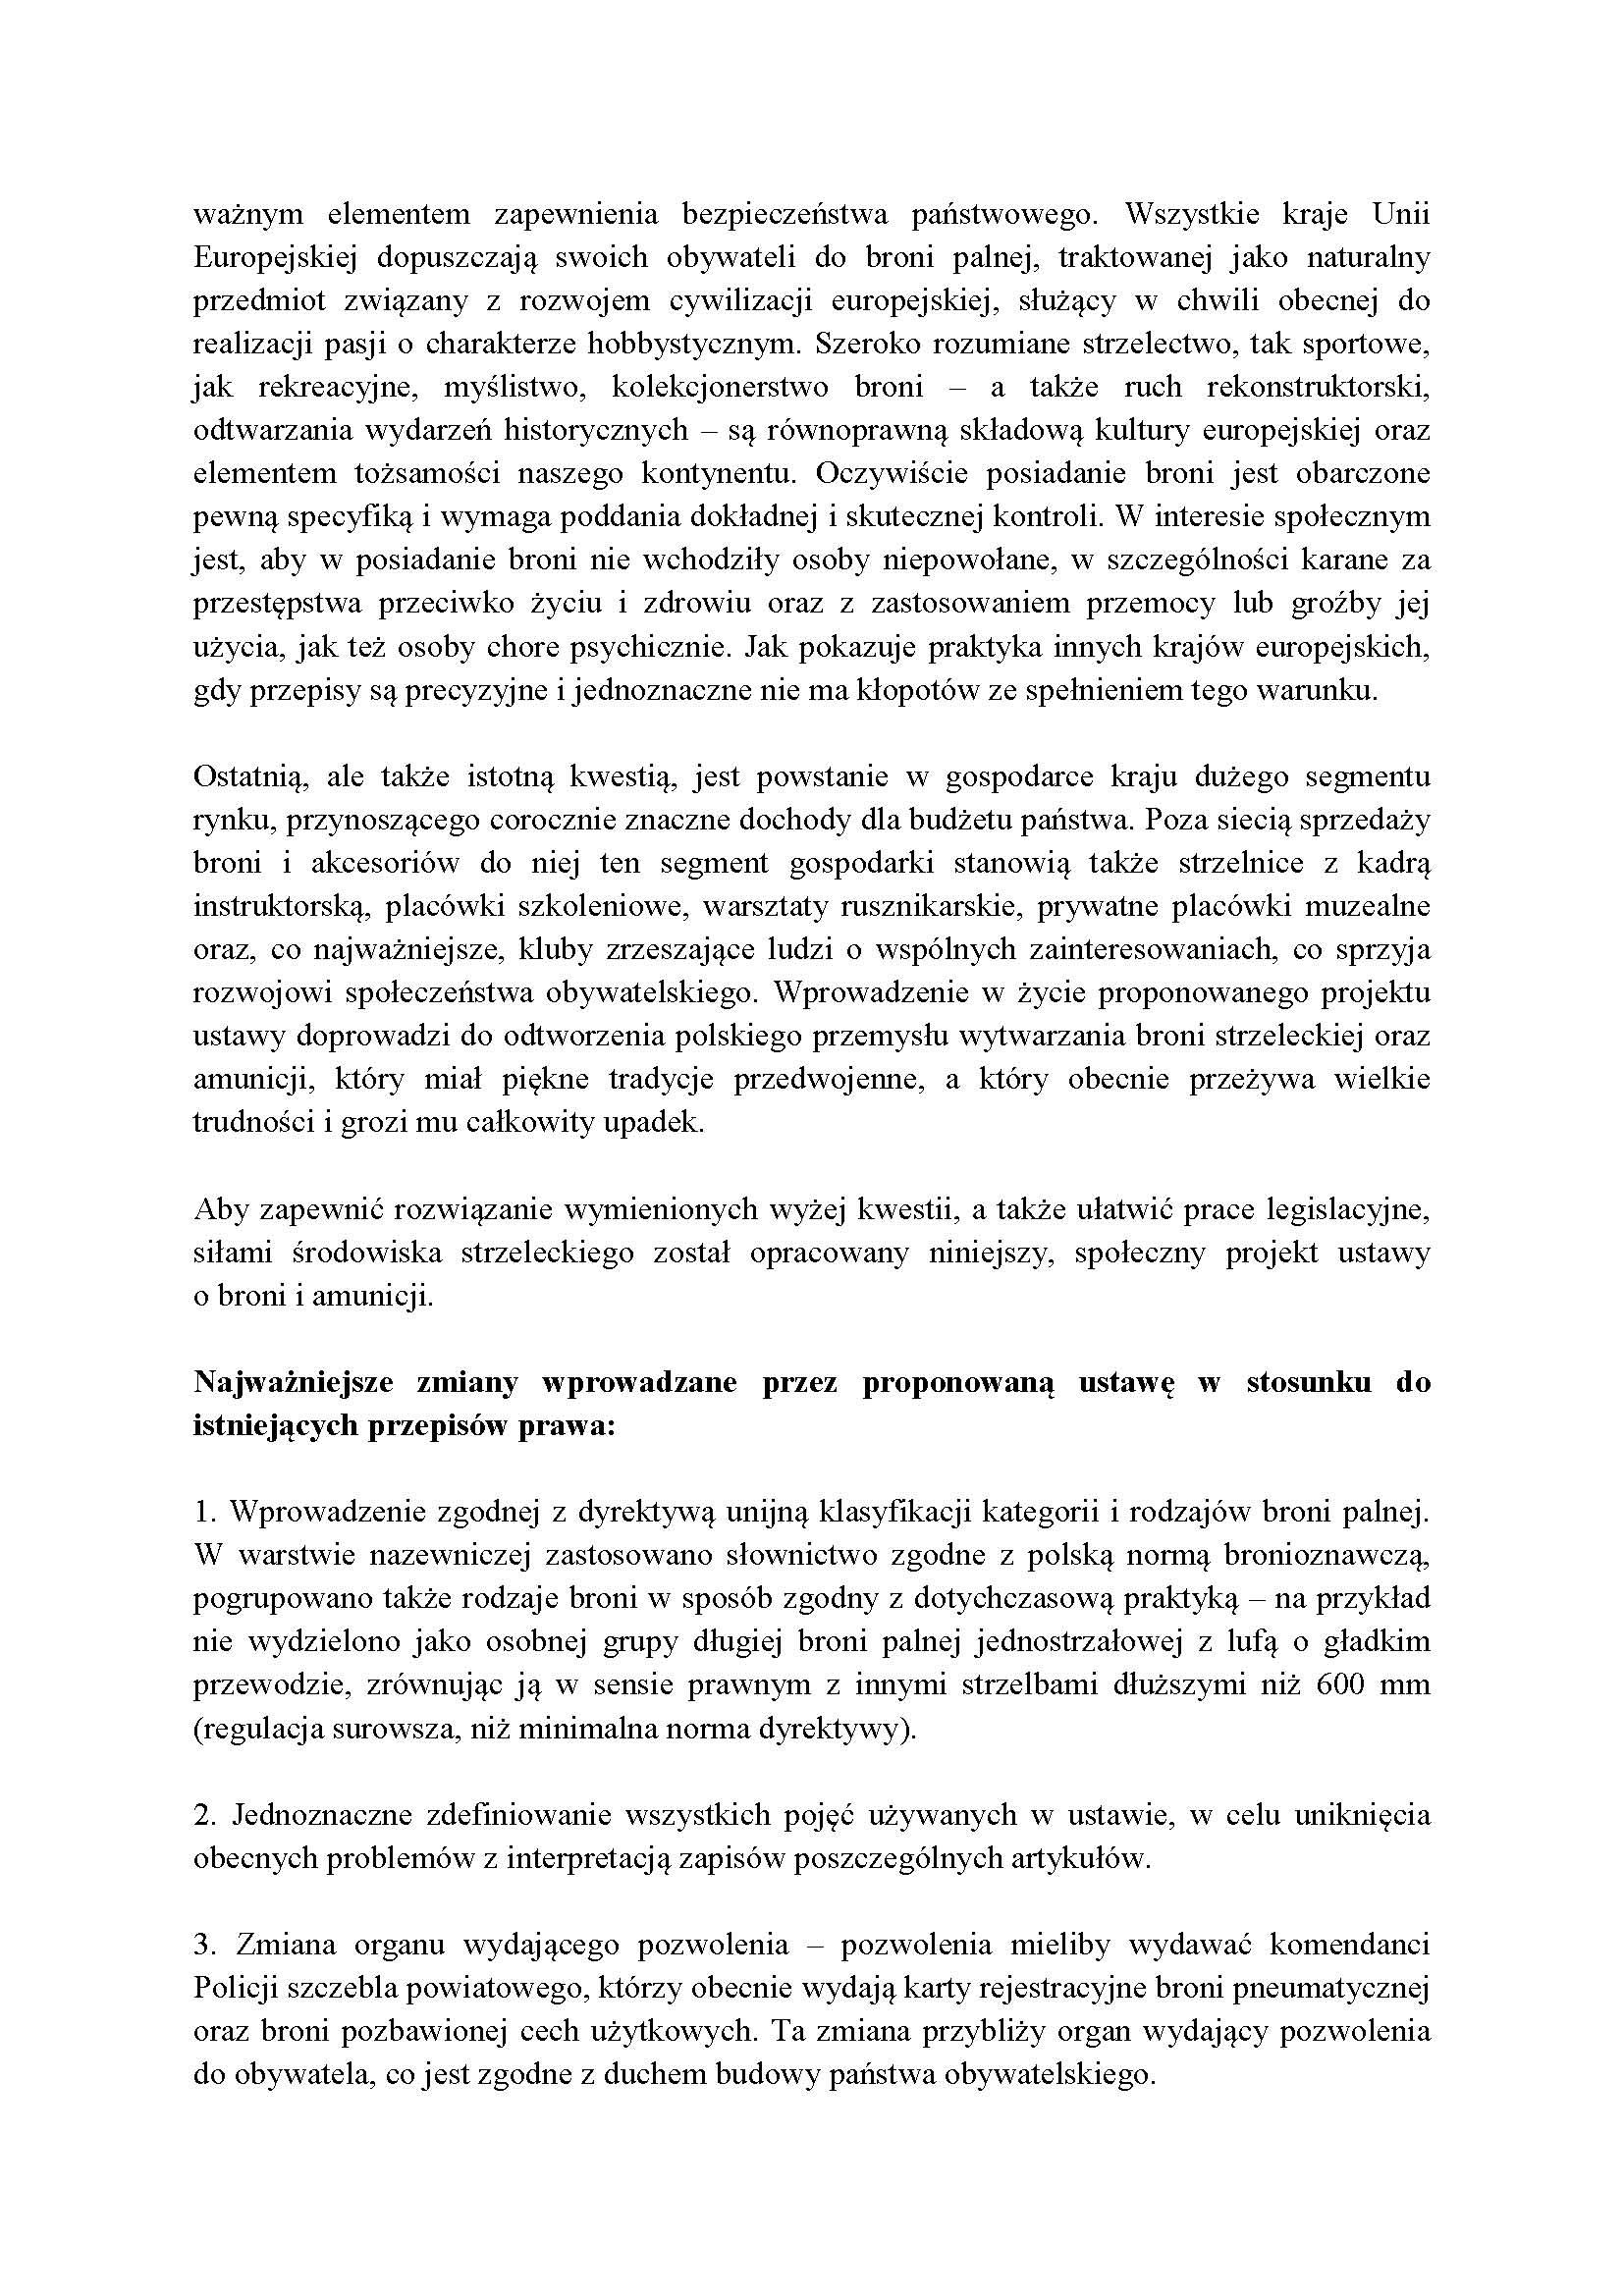 FRSwP_projekt_ustawy_20151125_Strona_28